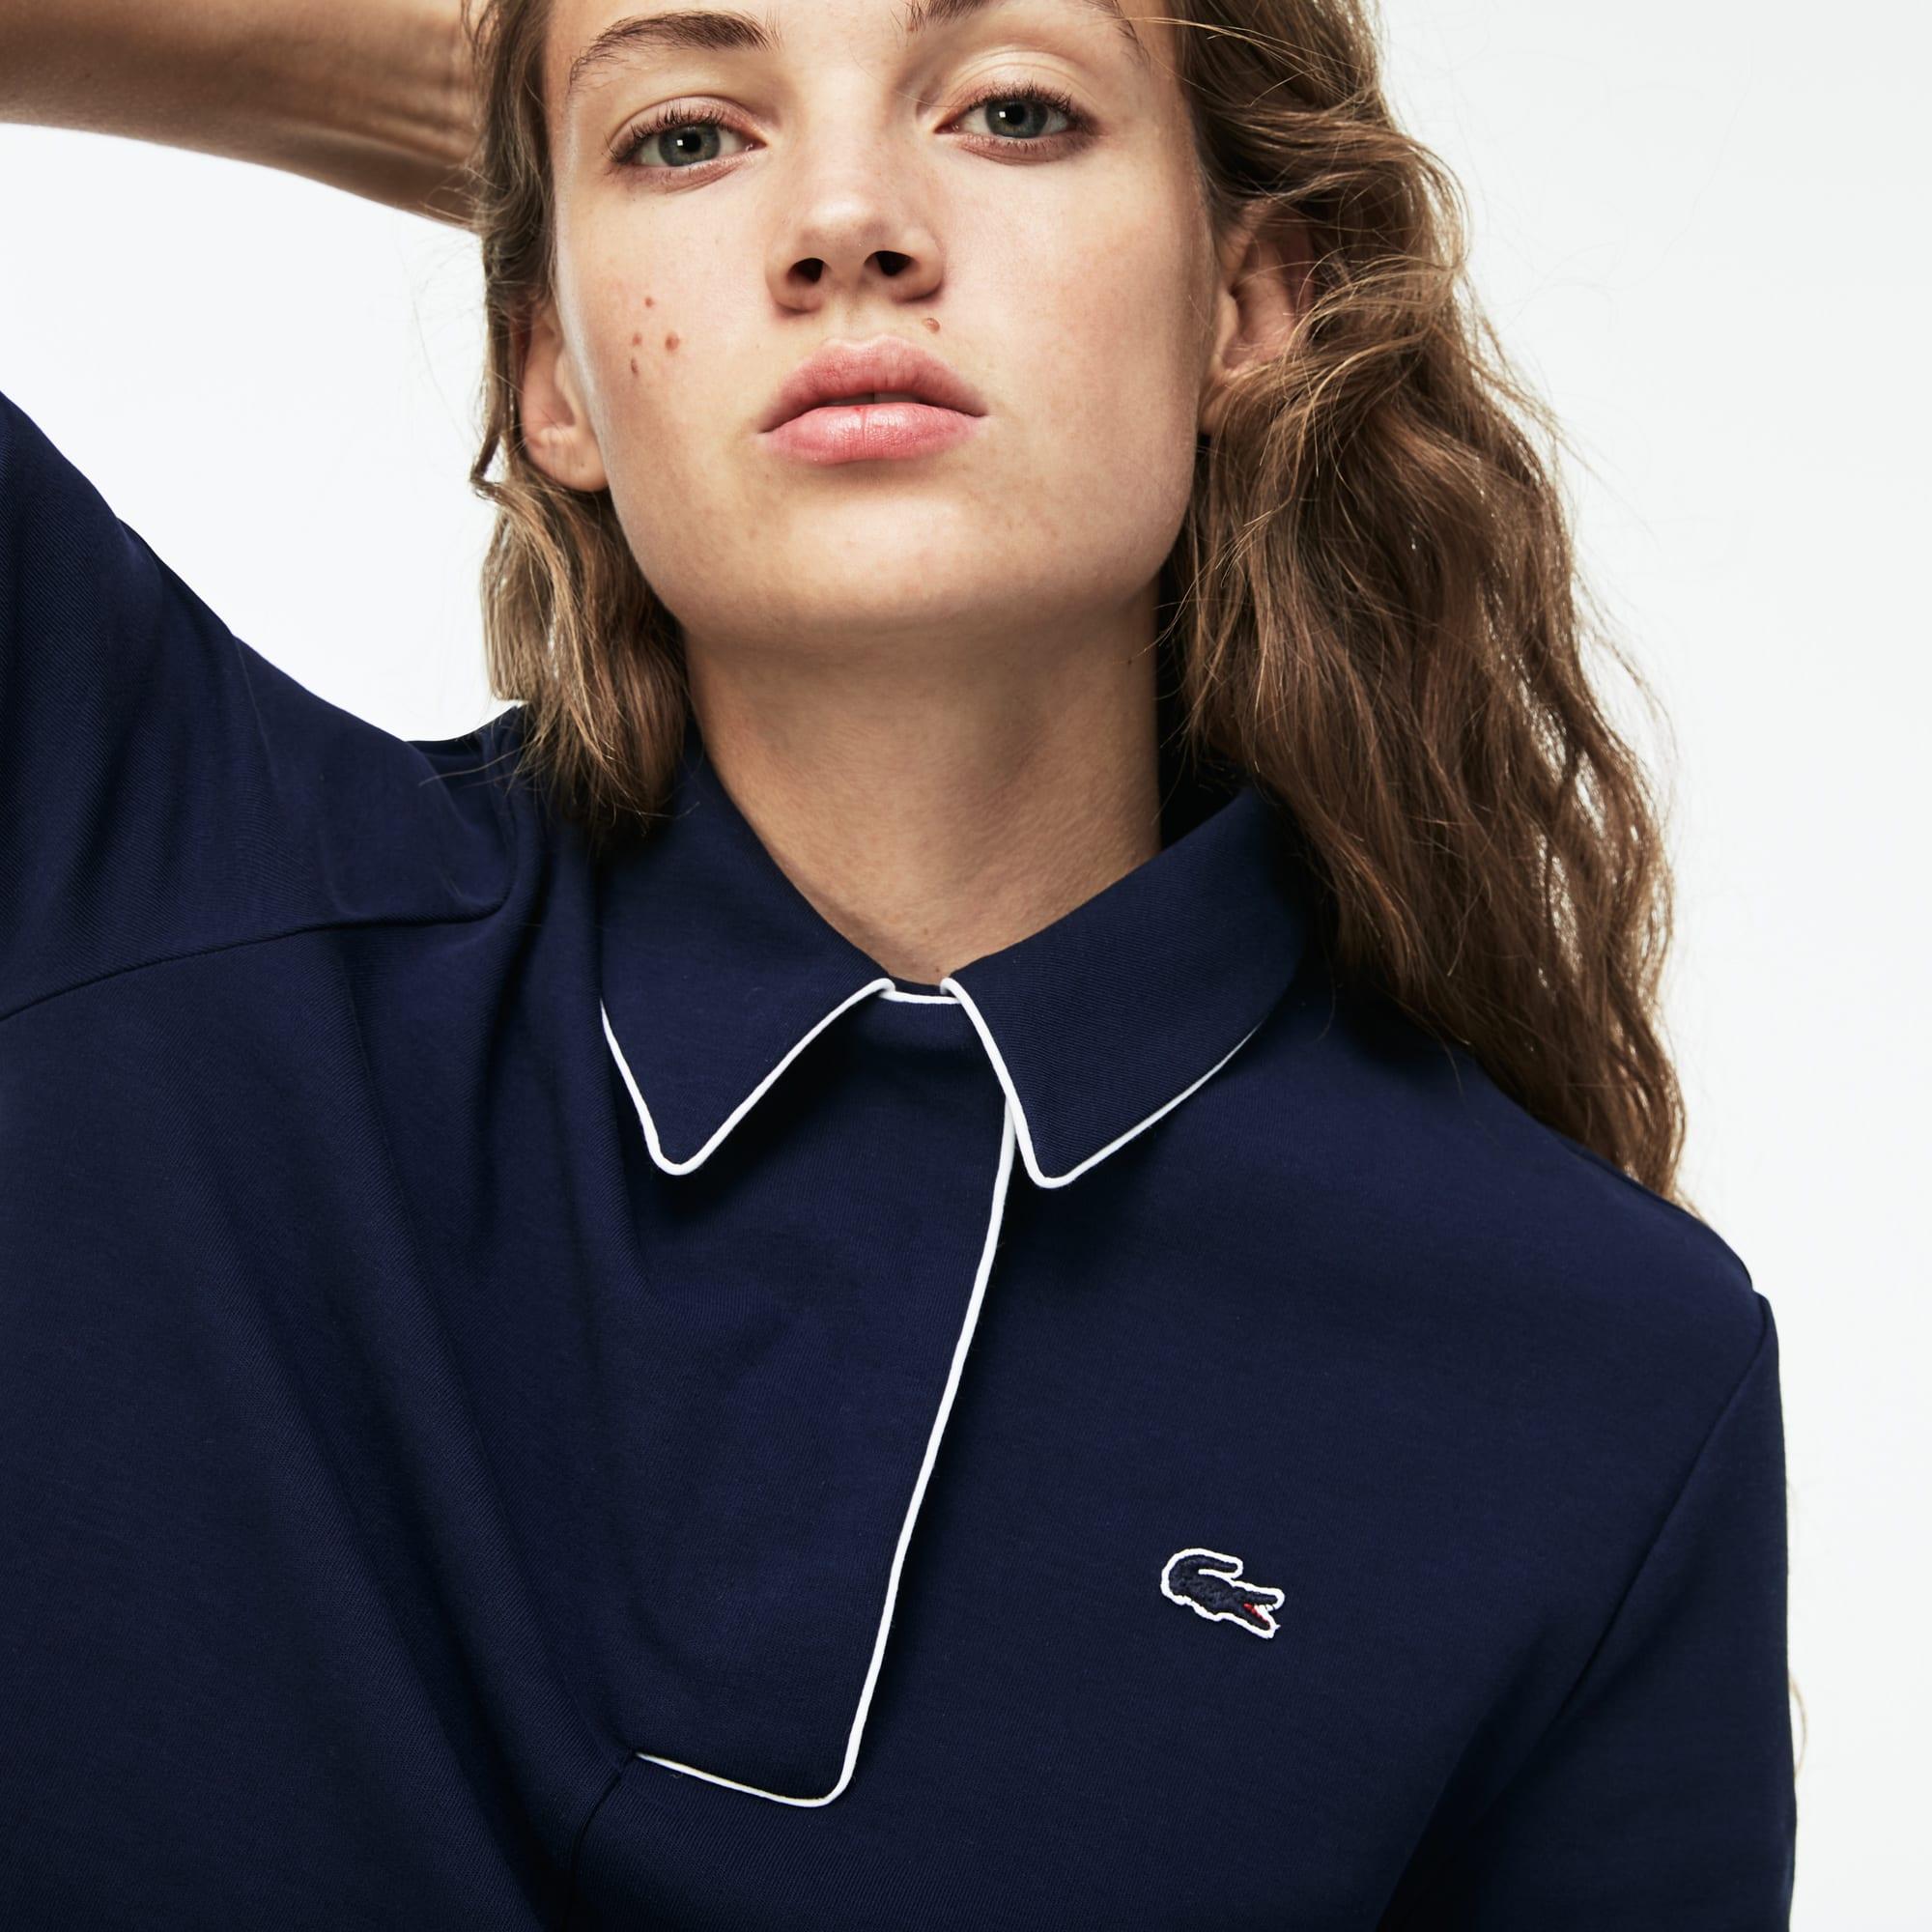 Women's Lacoste Piped Interlock Crepe Polo Shirt